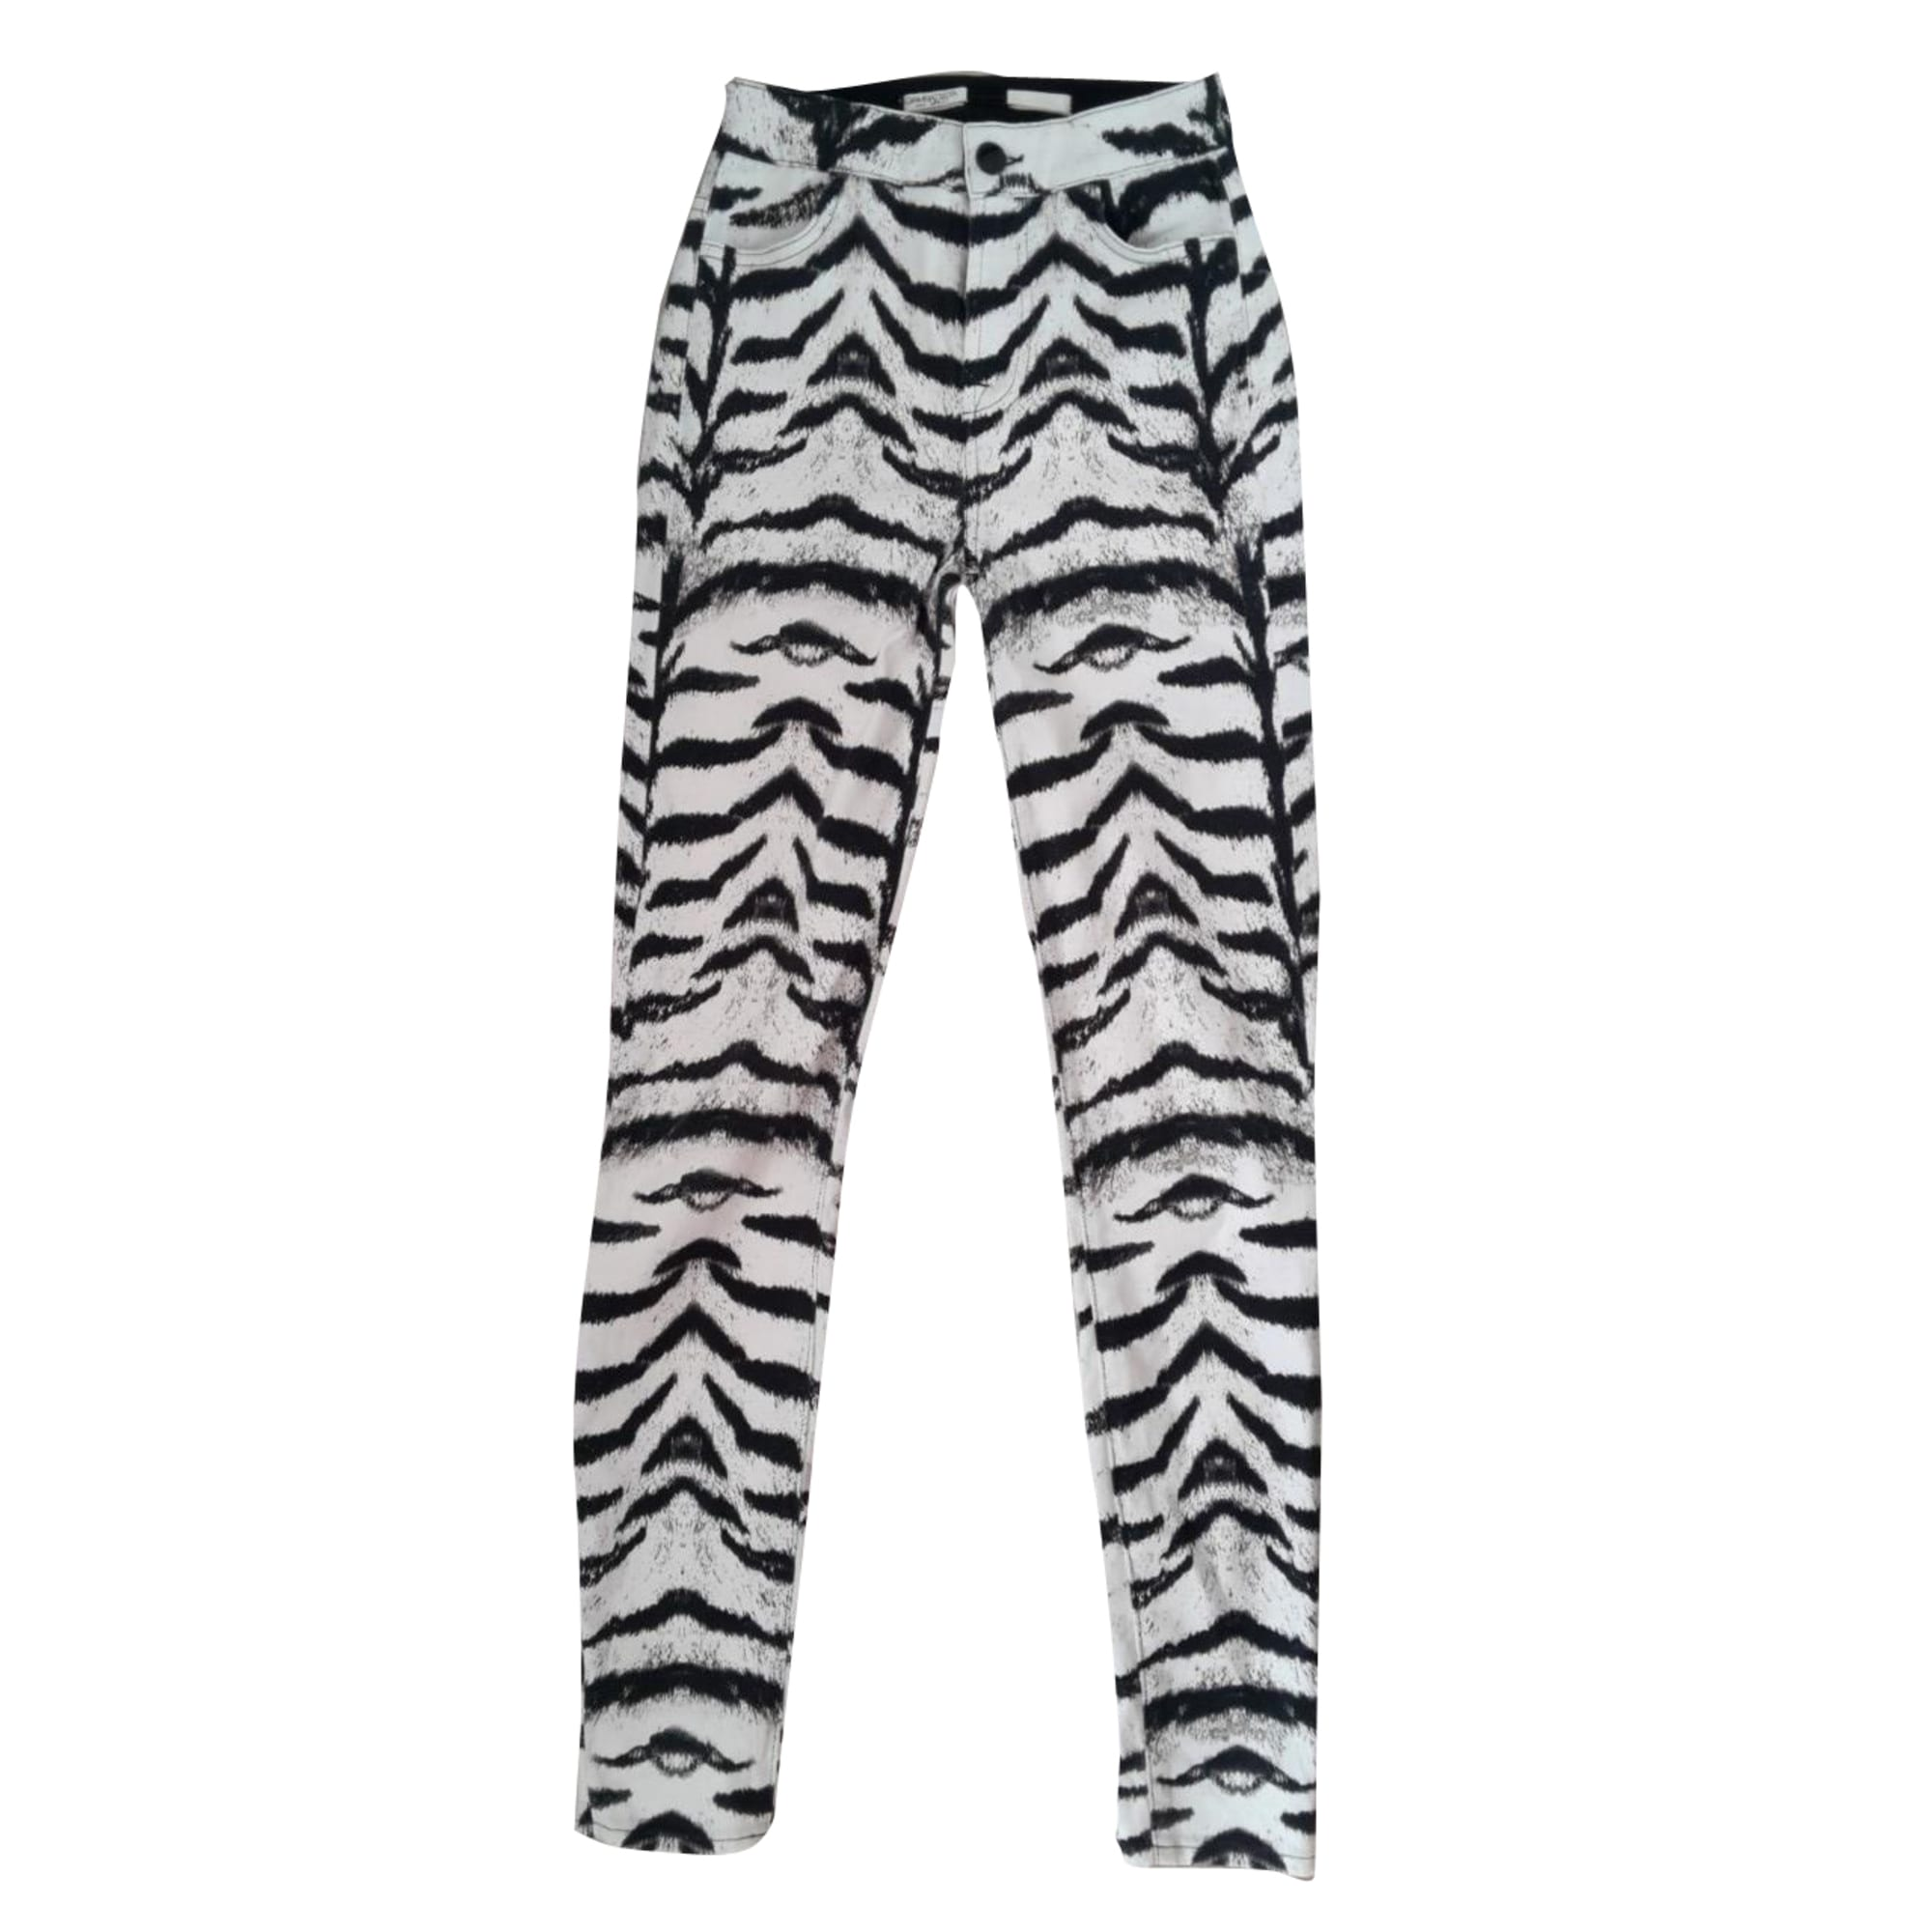 Pantalon slim, cigarette 7 FOR ALL MANKIND Imprimés animaliers